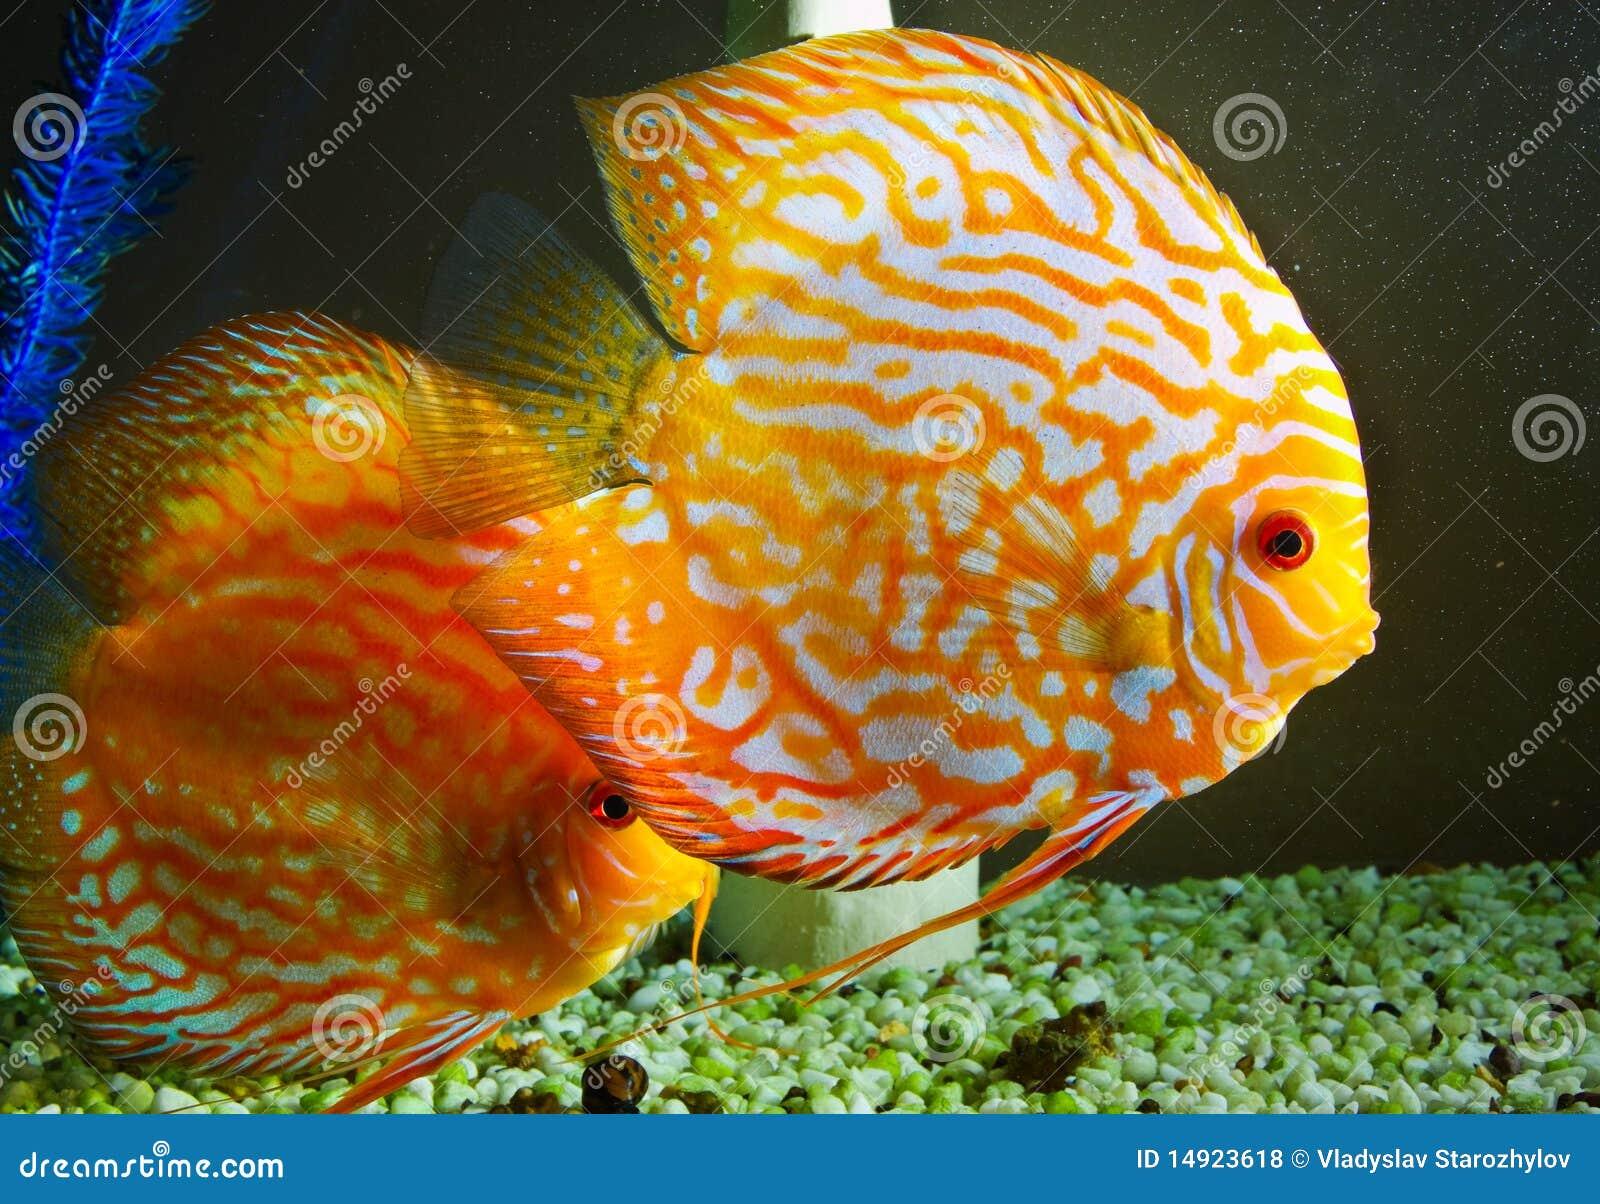 Freshwater Aquarium Fish Colorful Saltwater And Fresh